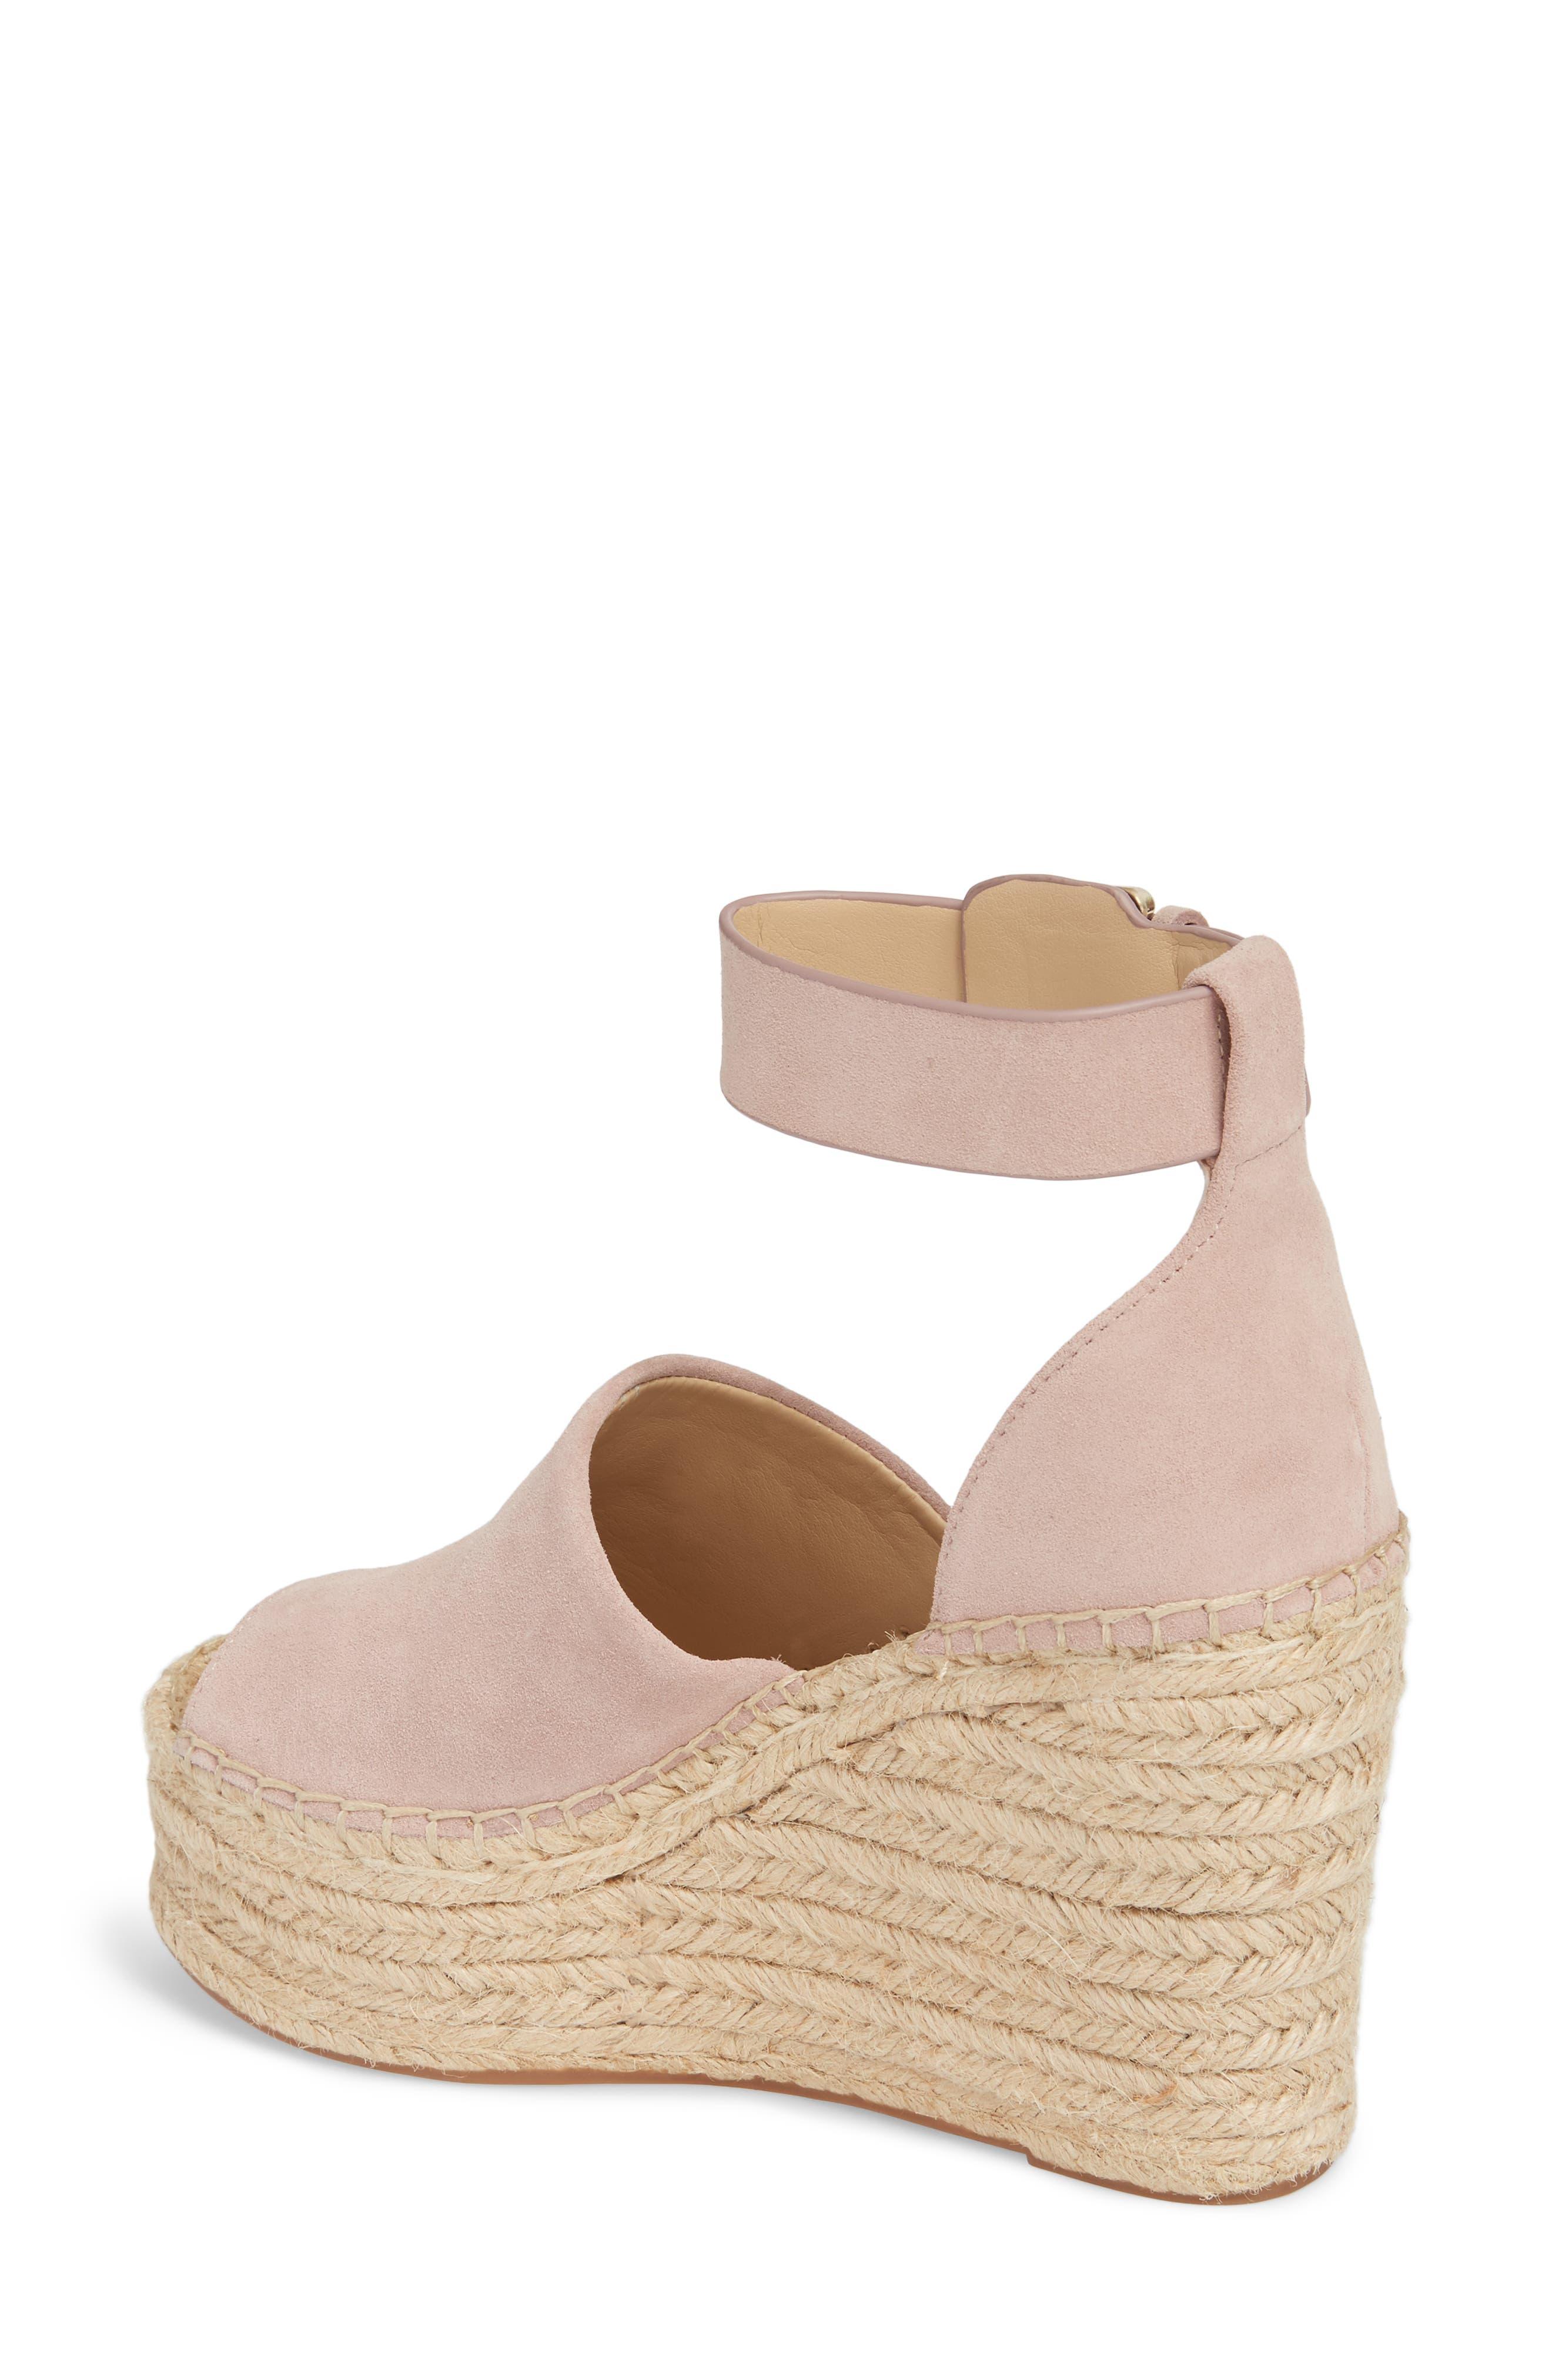 e14a7769c69b Women s Marc Fisher LTD Wedge Sandals